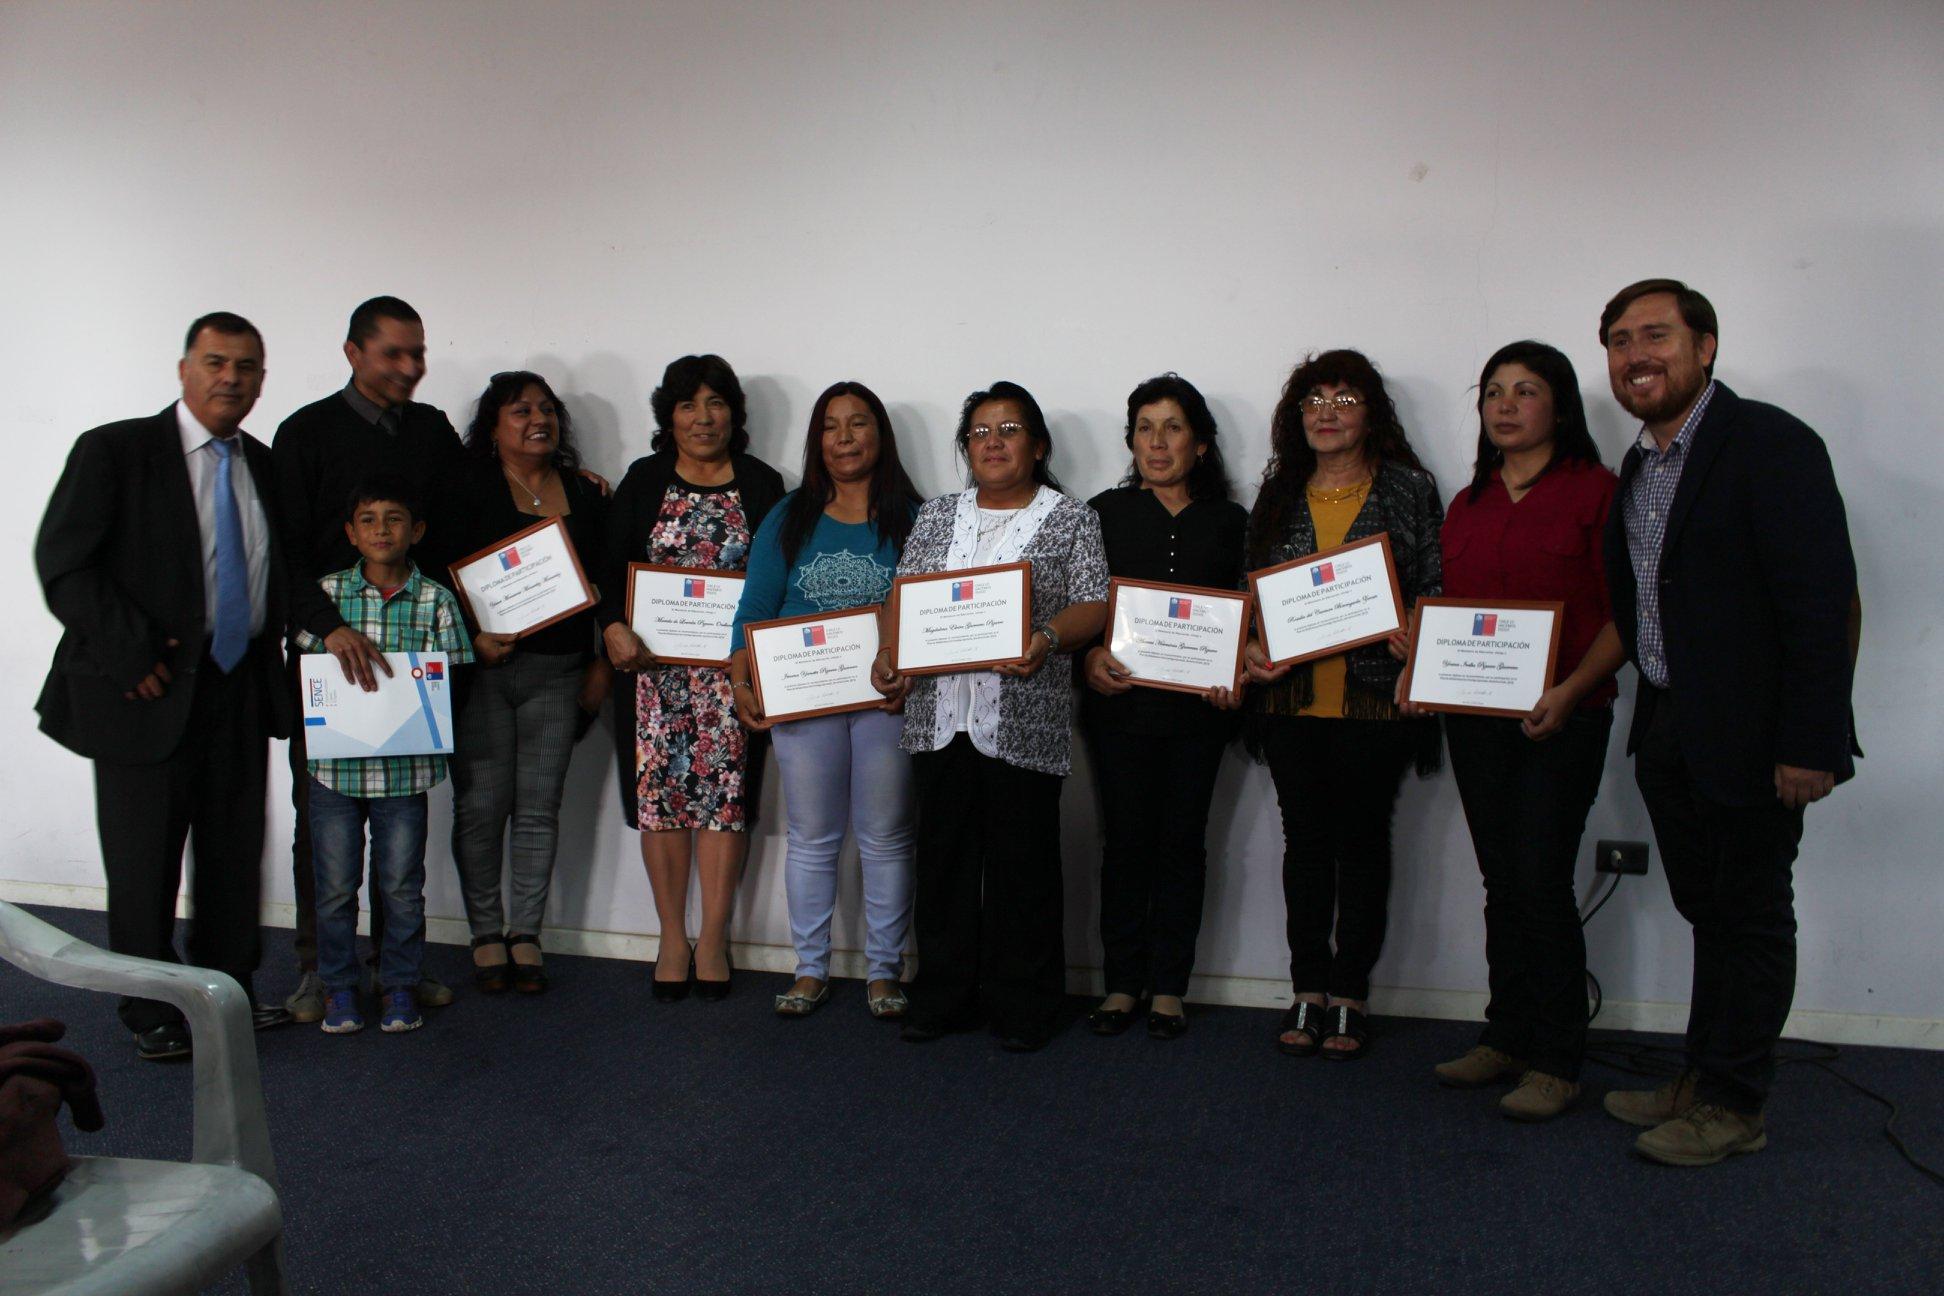 Adultos aprendieron a leer y escribir gracias a programa de alfabetización Contigo Aprendo